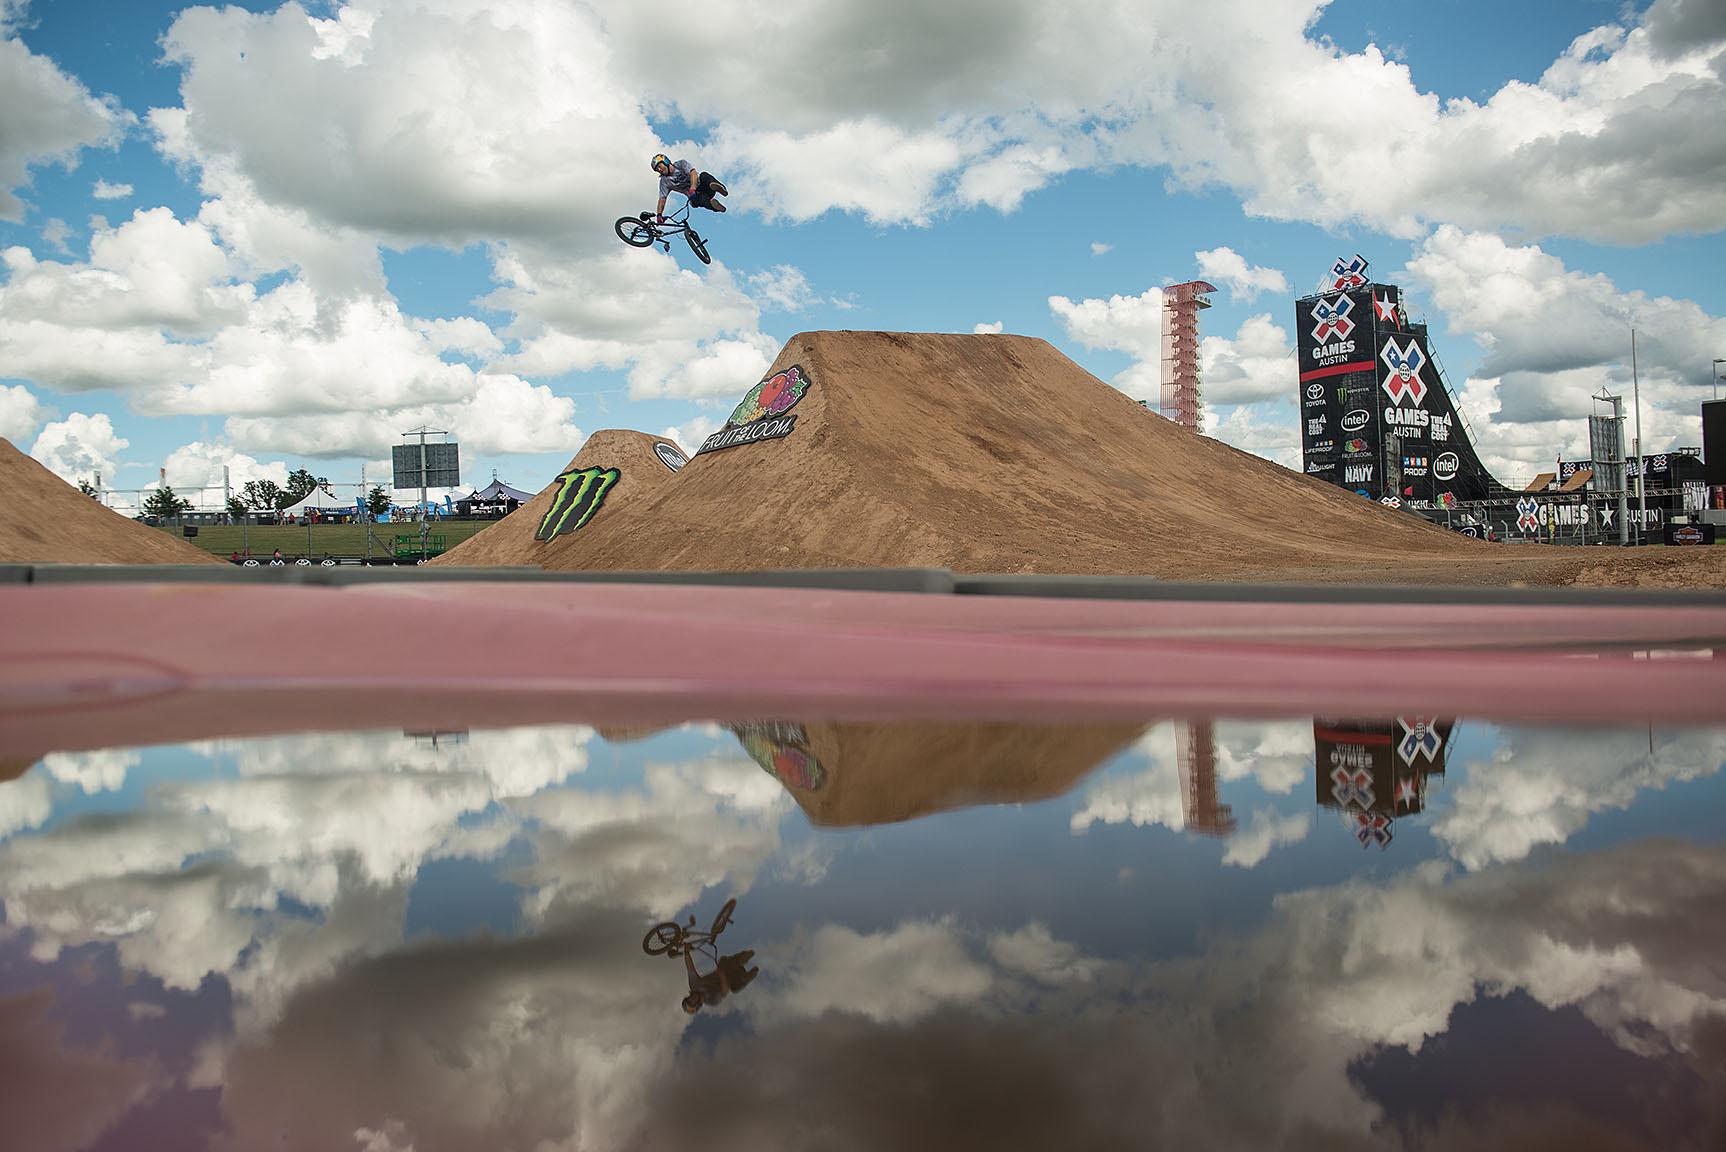 BMX Dirt practice ~ Mike Clark